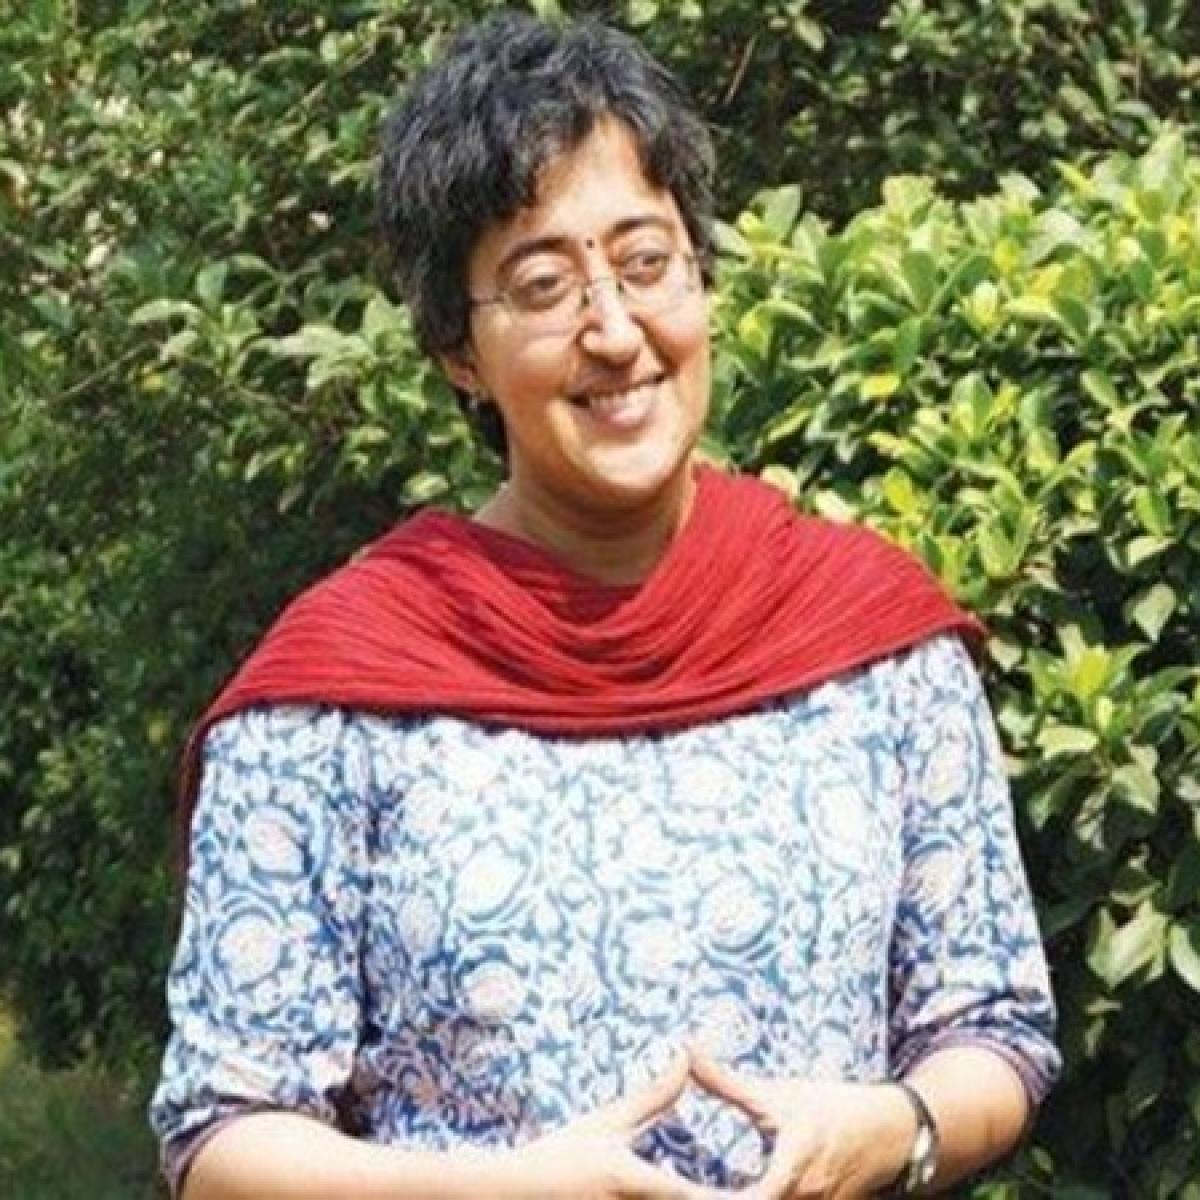 Coronavirus in Delhi: AAP's Atishi Marlena tests positive for coronavirus